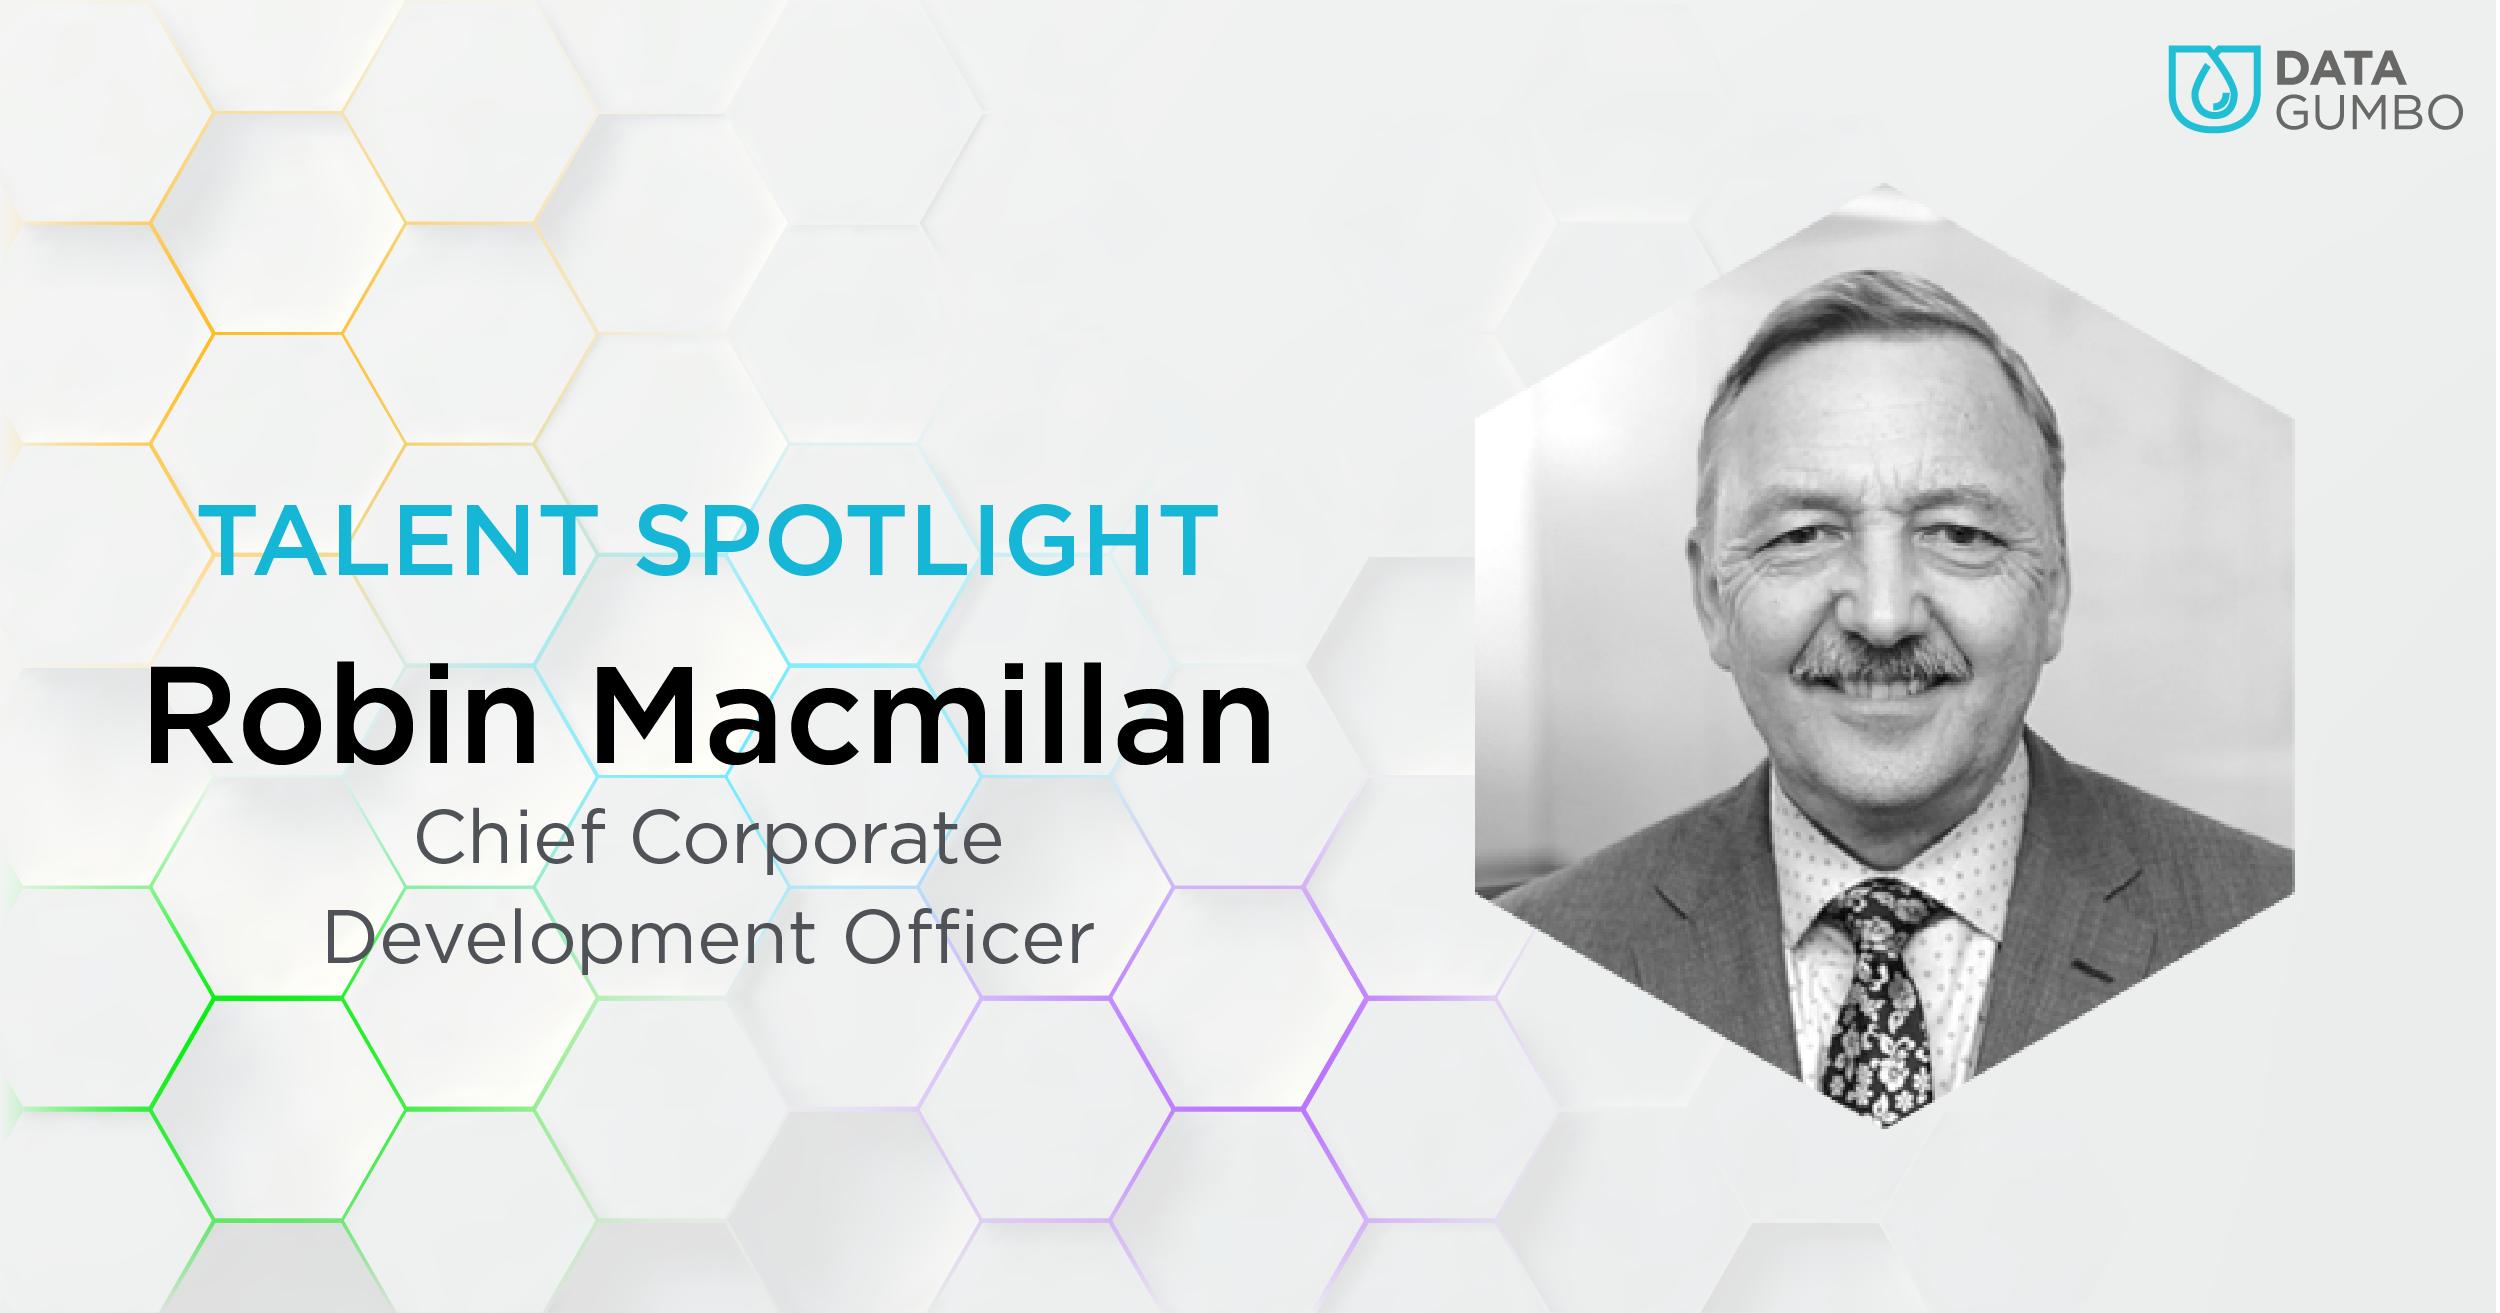 Data Gumbo: Talent Spotlight - Robin Macmillan